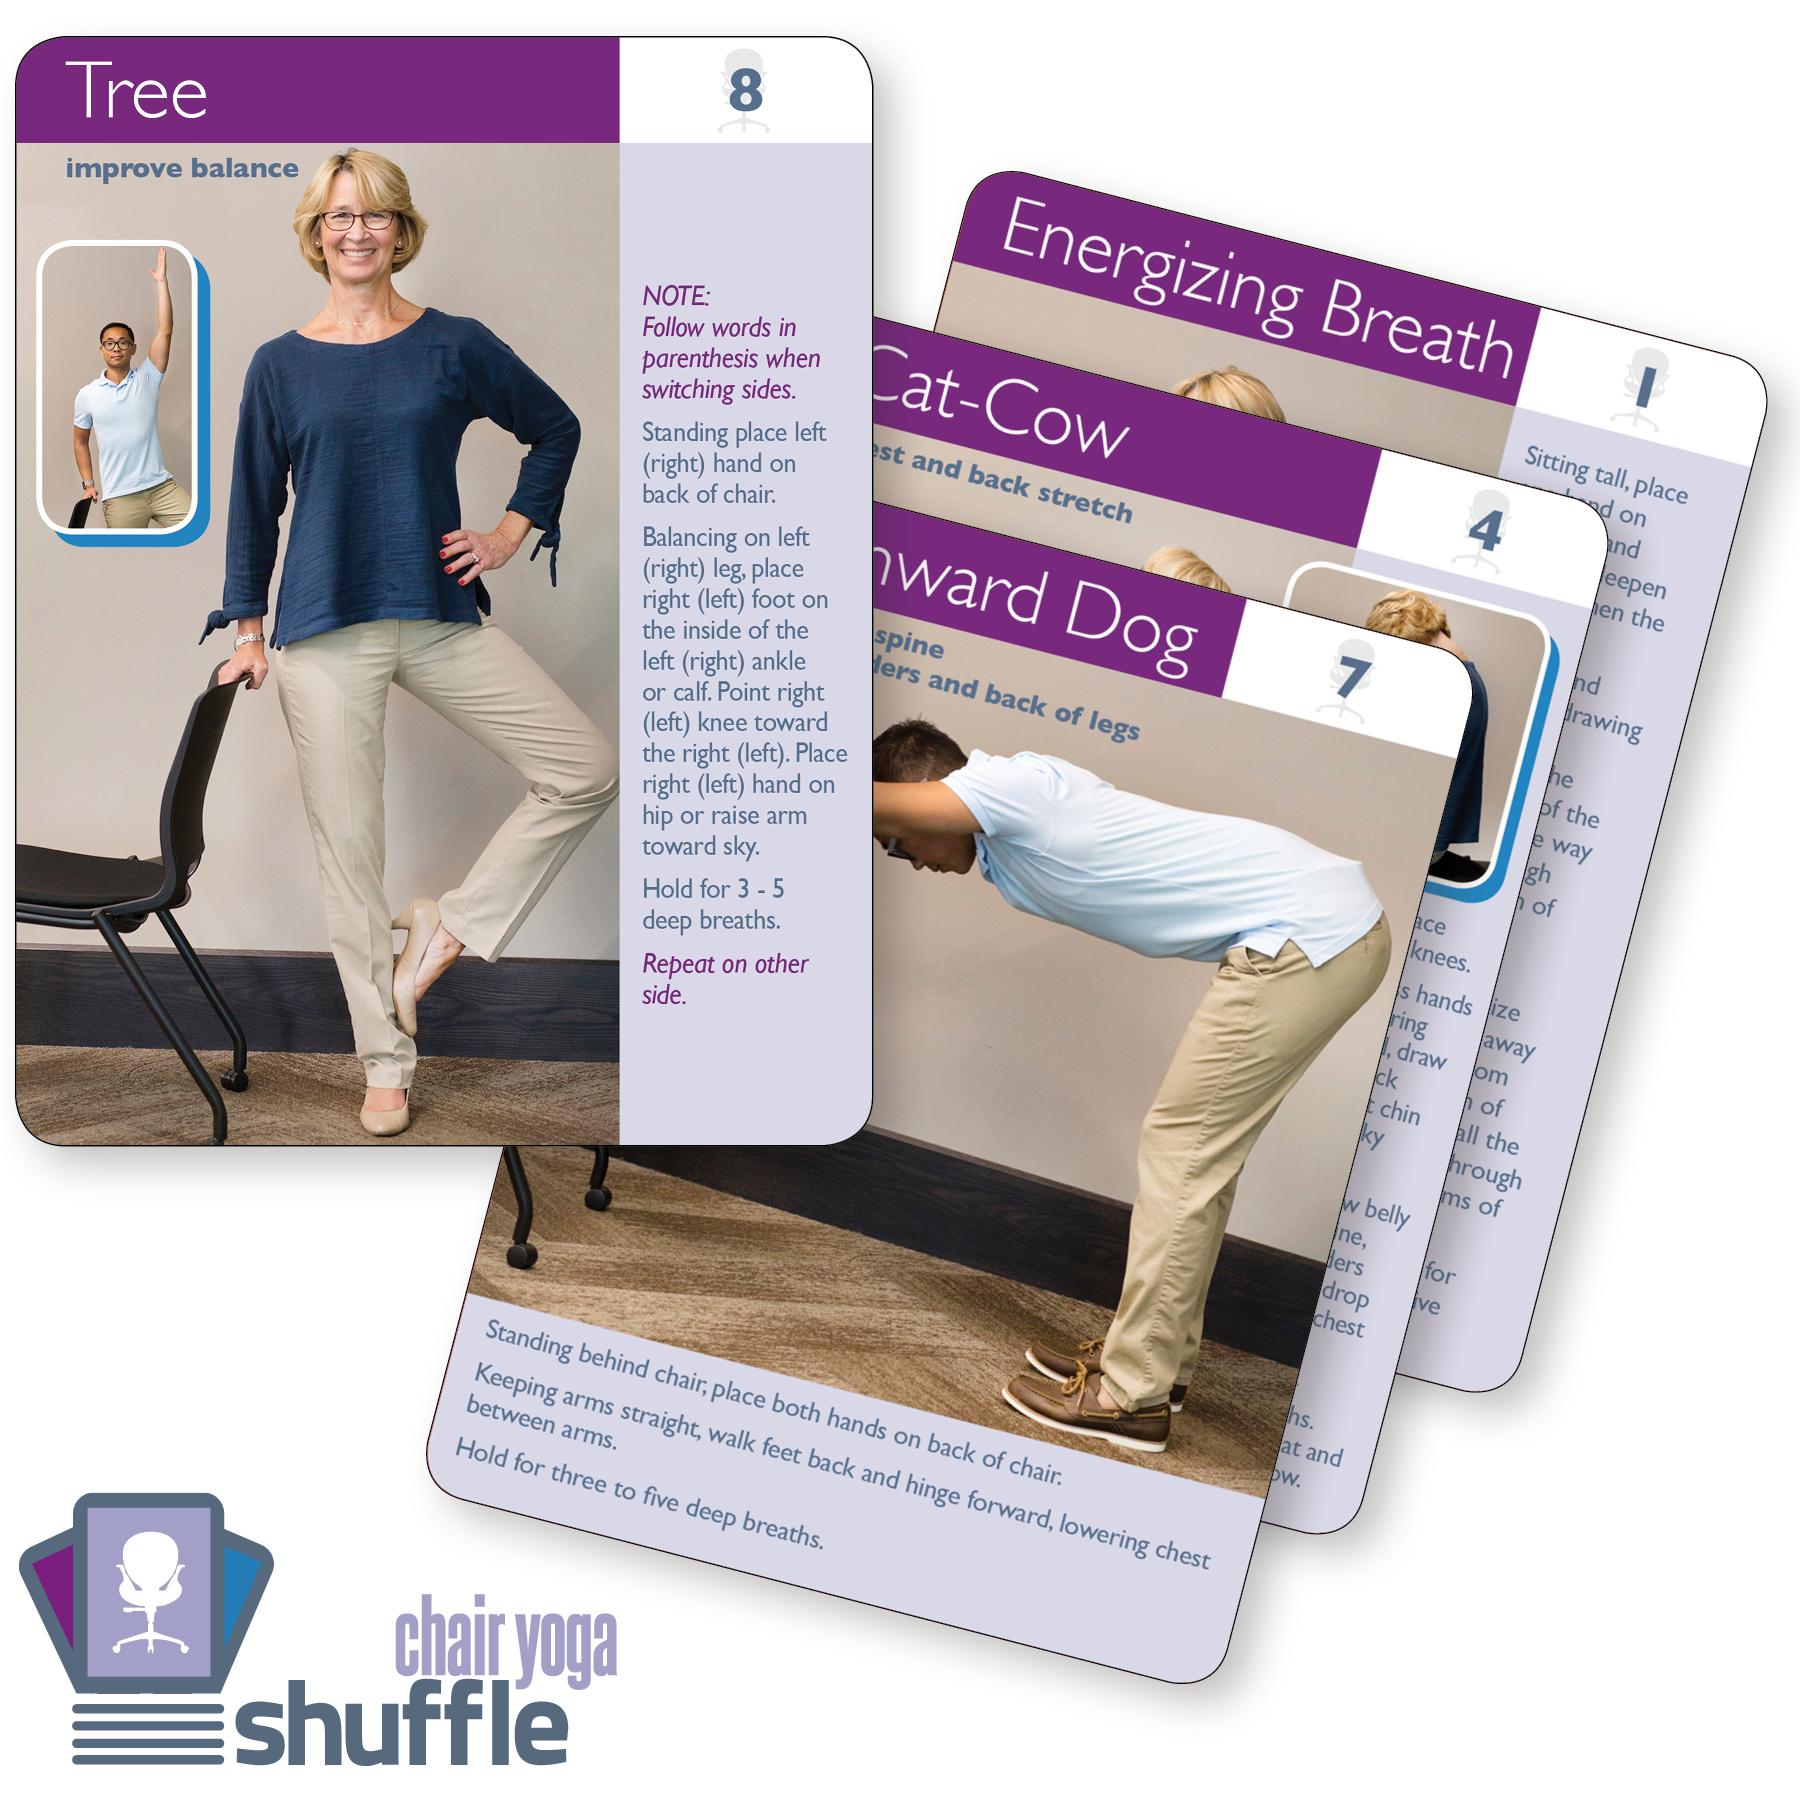 chair yoga shuffle cards